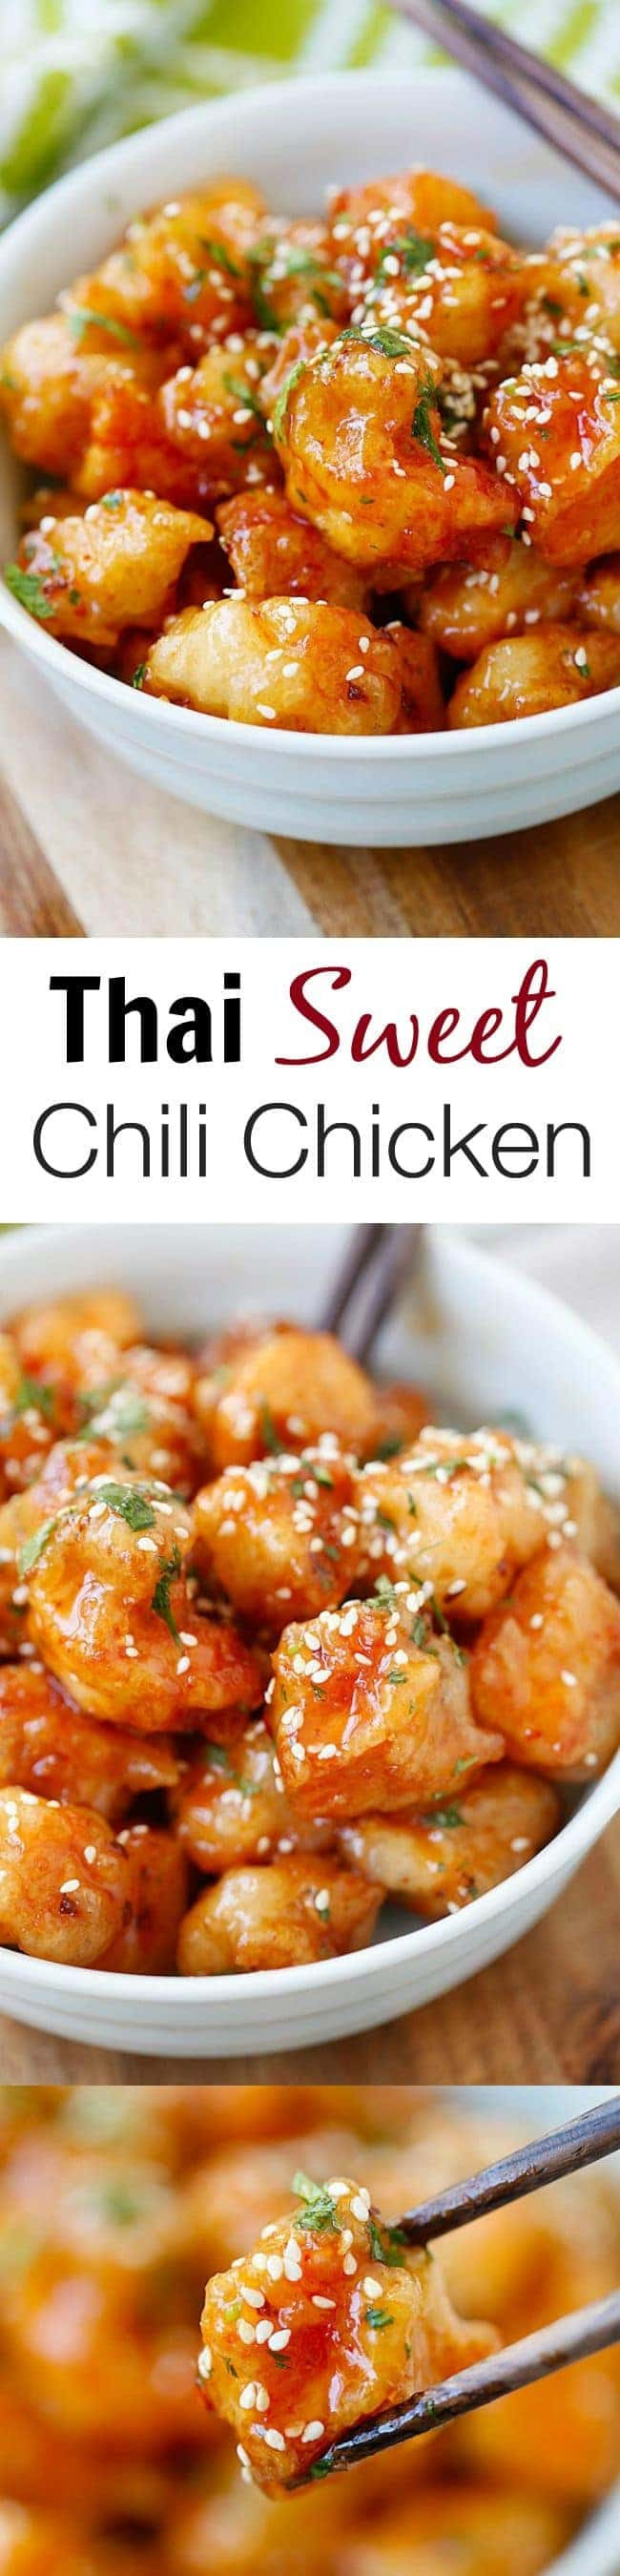 Sweet Chili Chicken  Thai Sweet Chili Chicken